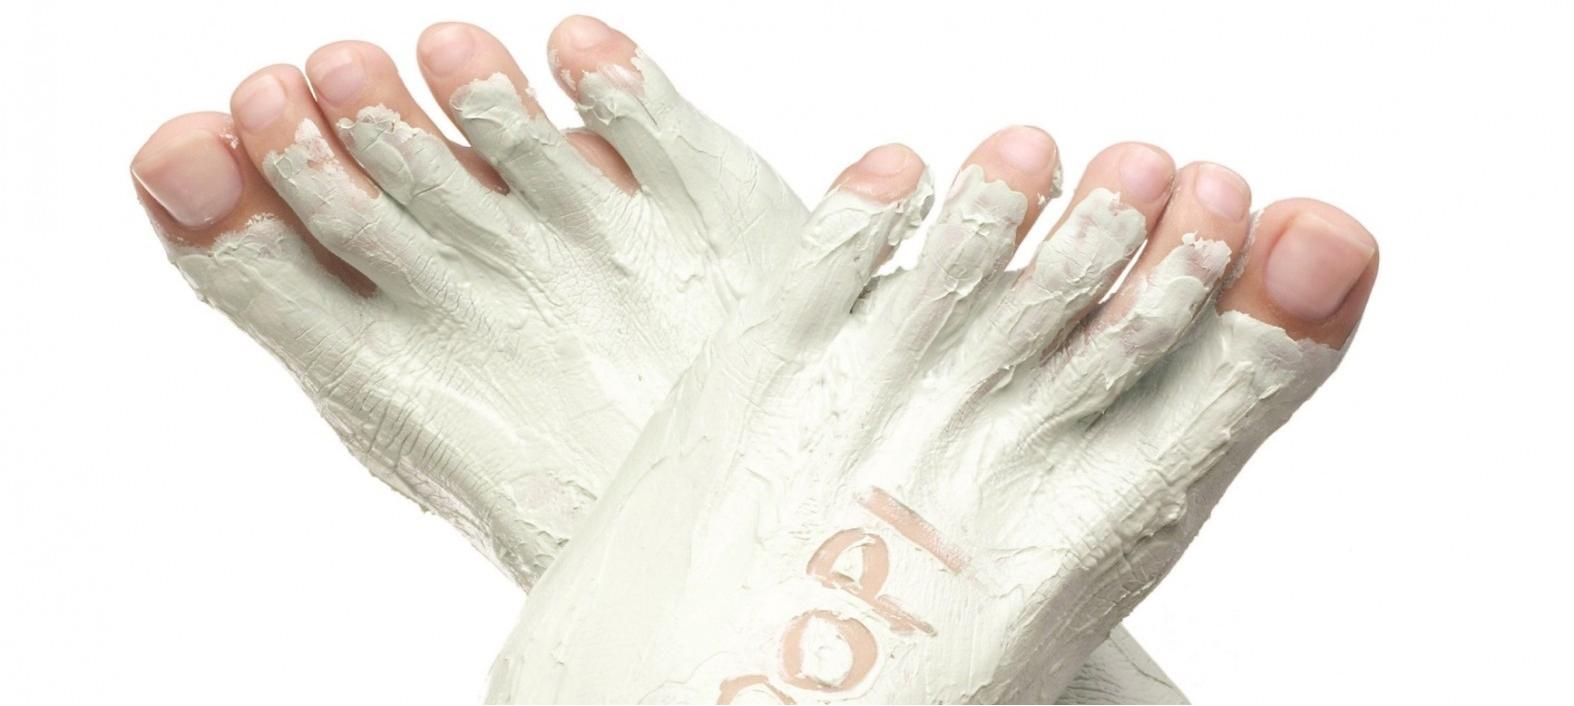 hand and feet 1